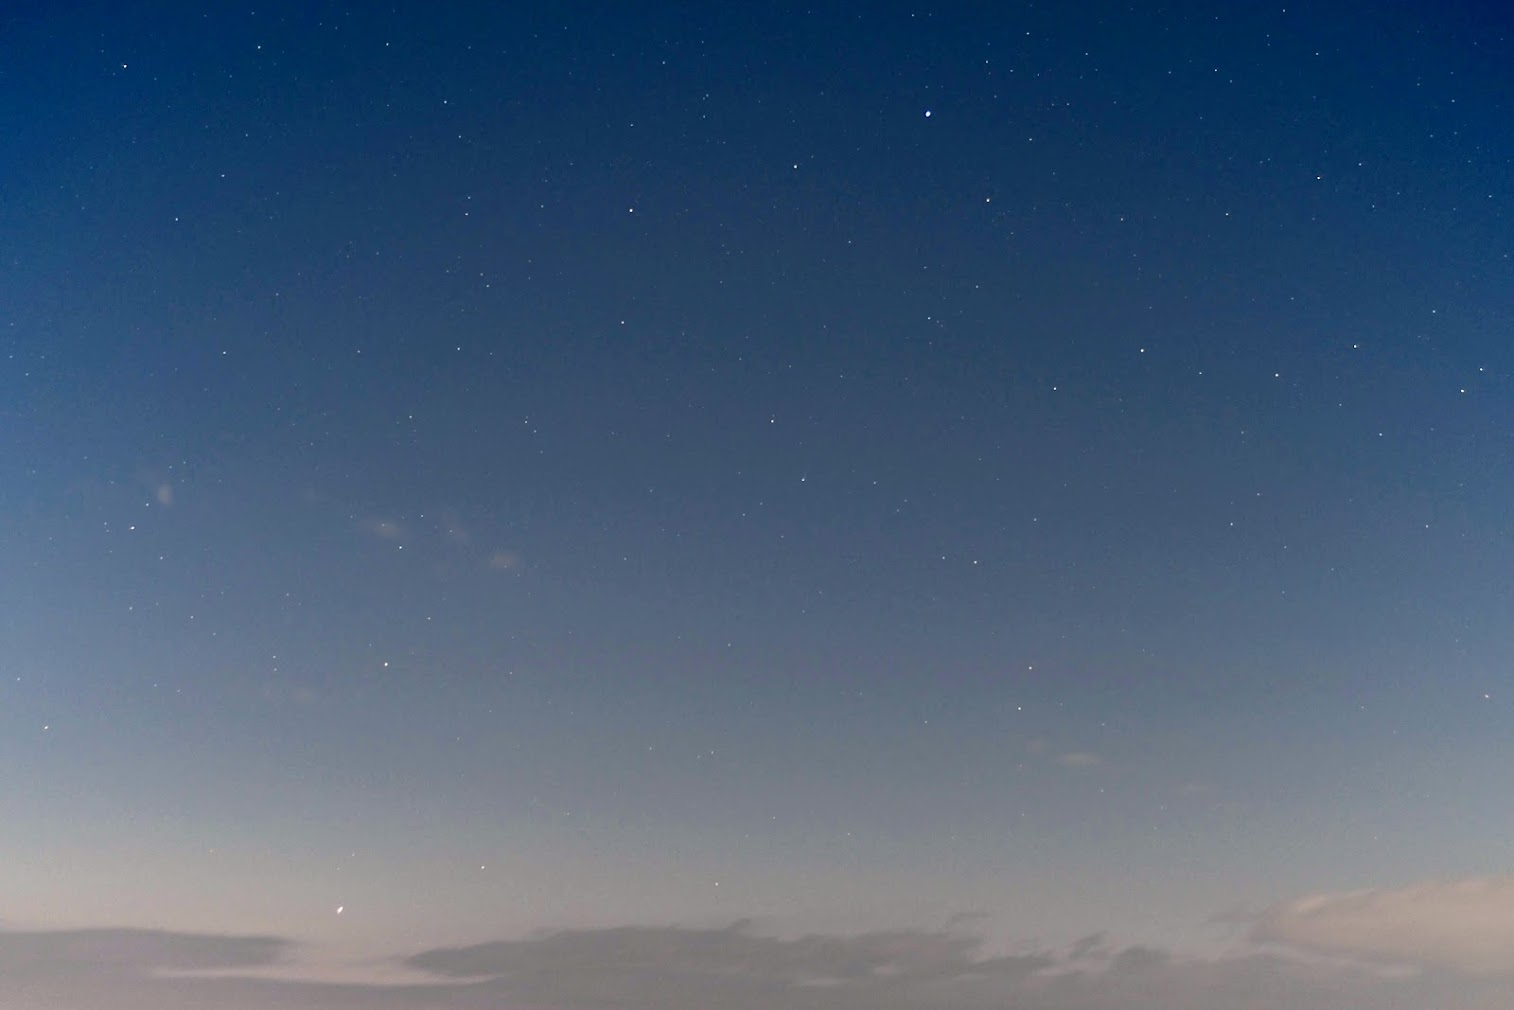 Comet ISON (C/2012 S1) on November 20, 2013